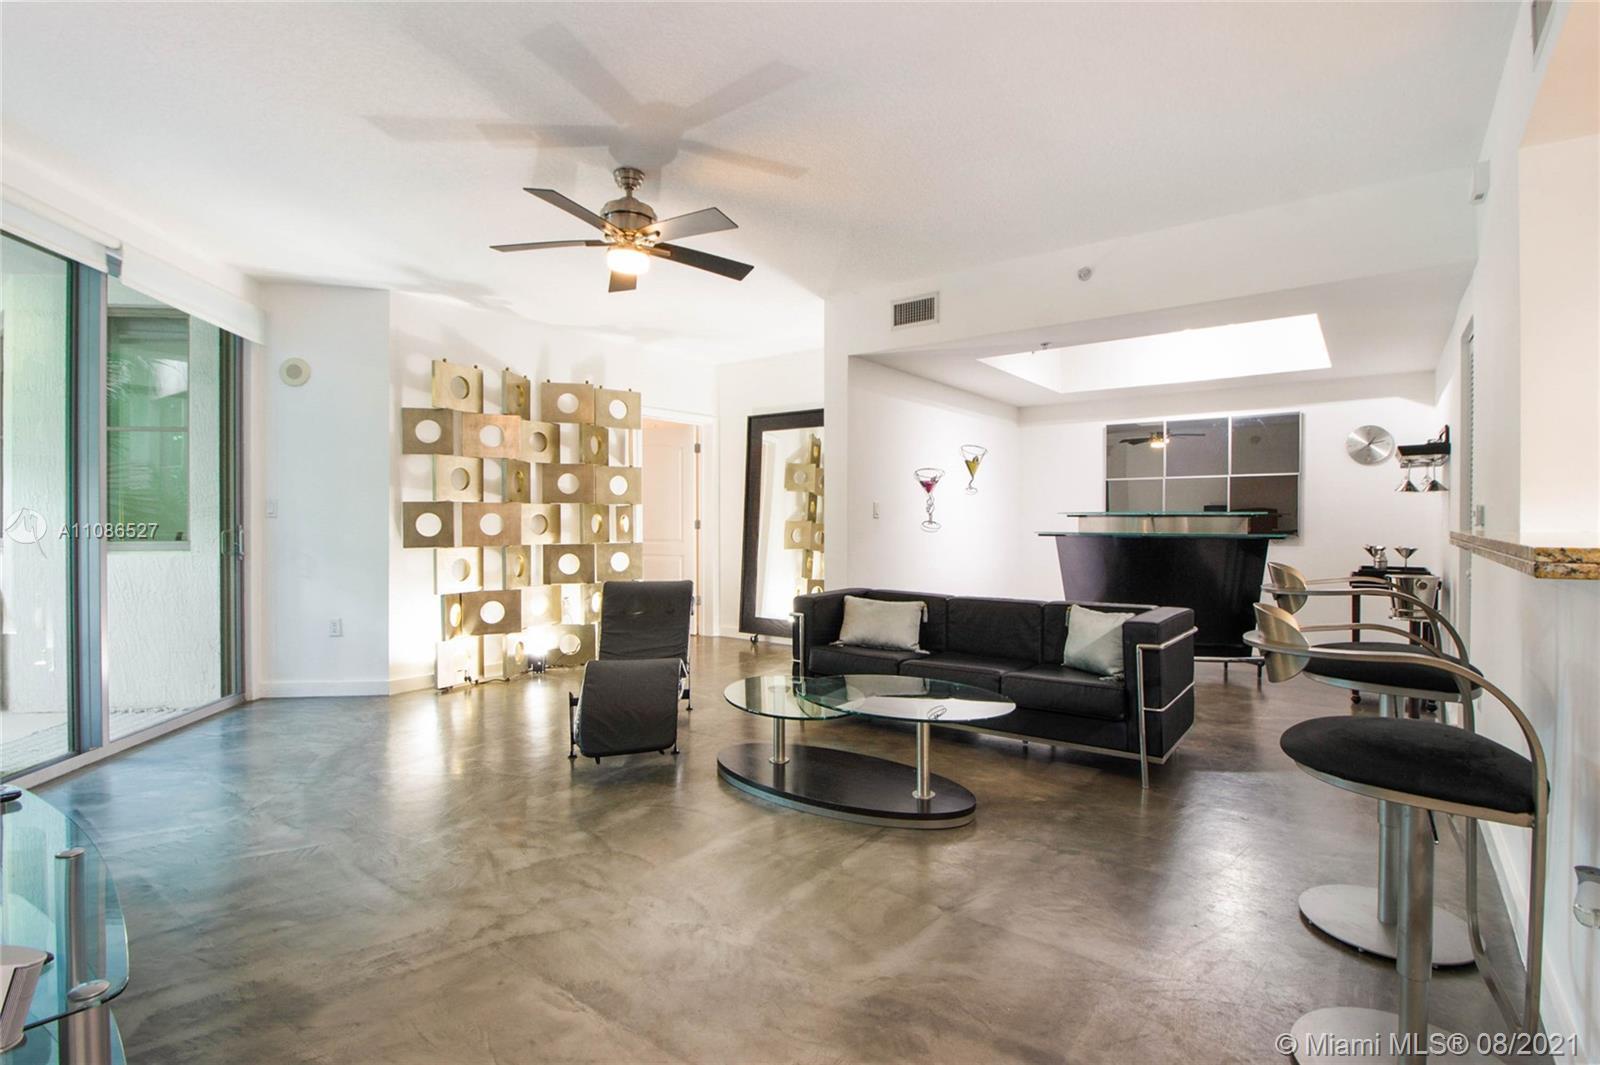 Cosmopolitan #1508 - 110 Washington Ave #1508, Miami Beach, FL 33139